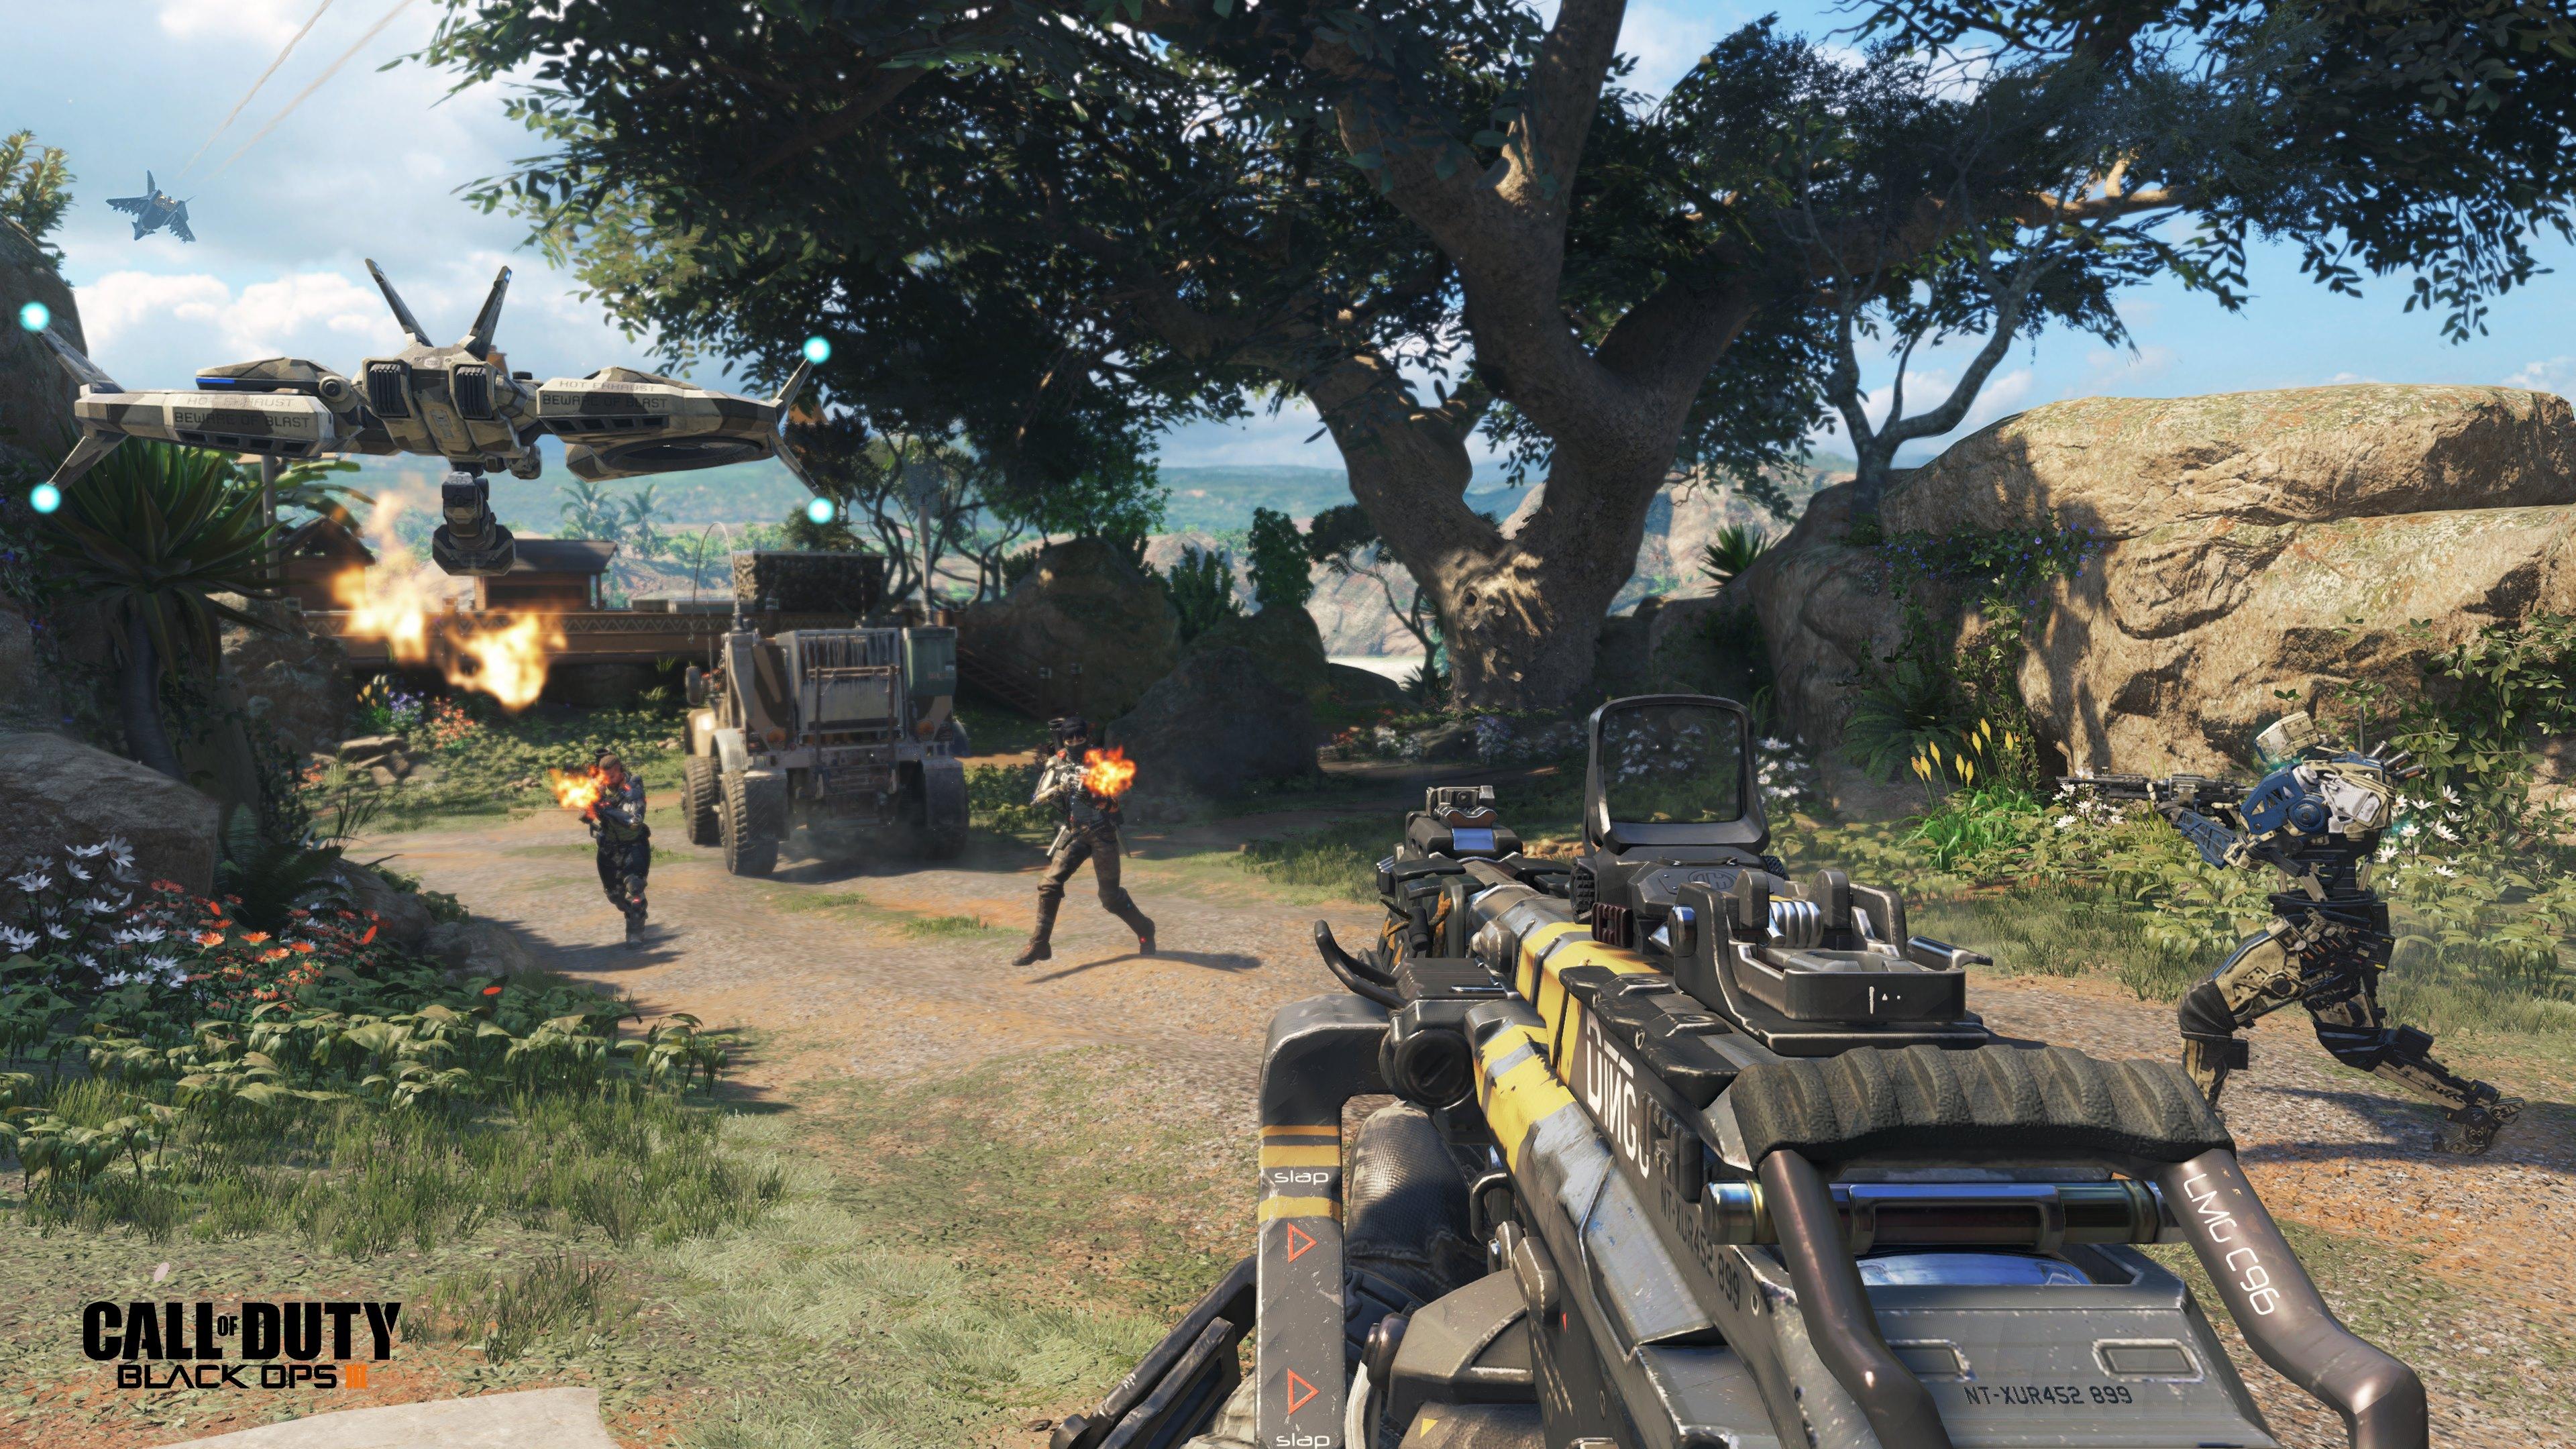 Call of Duty: Black Ops 3 - в далеком 2065 году...